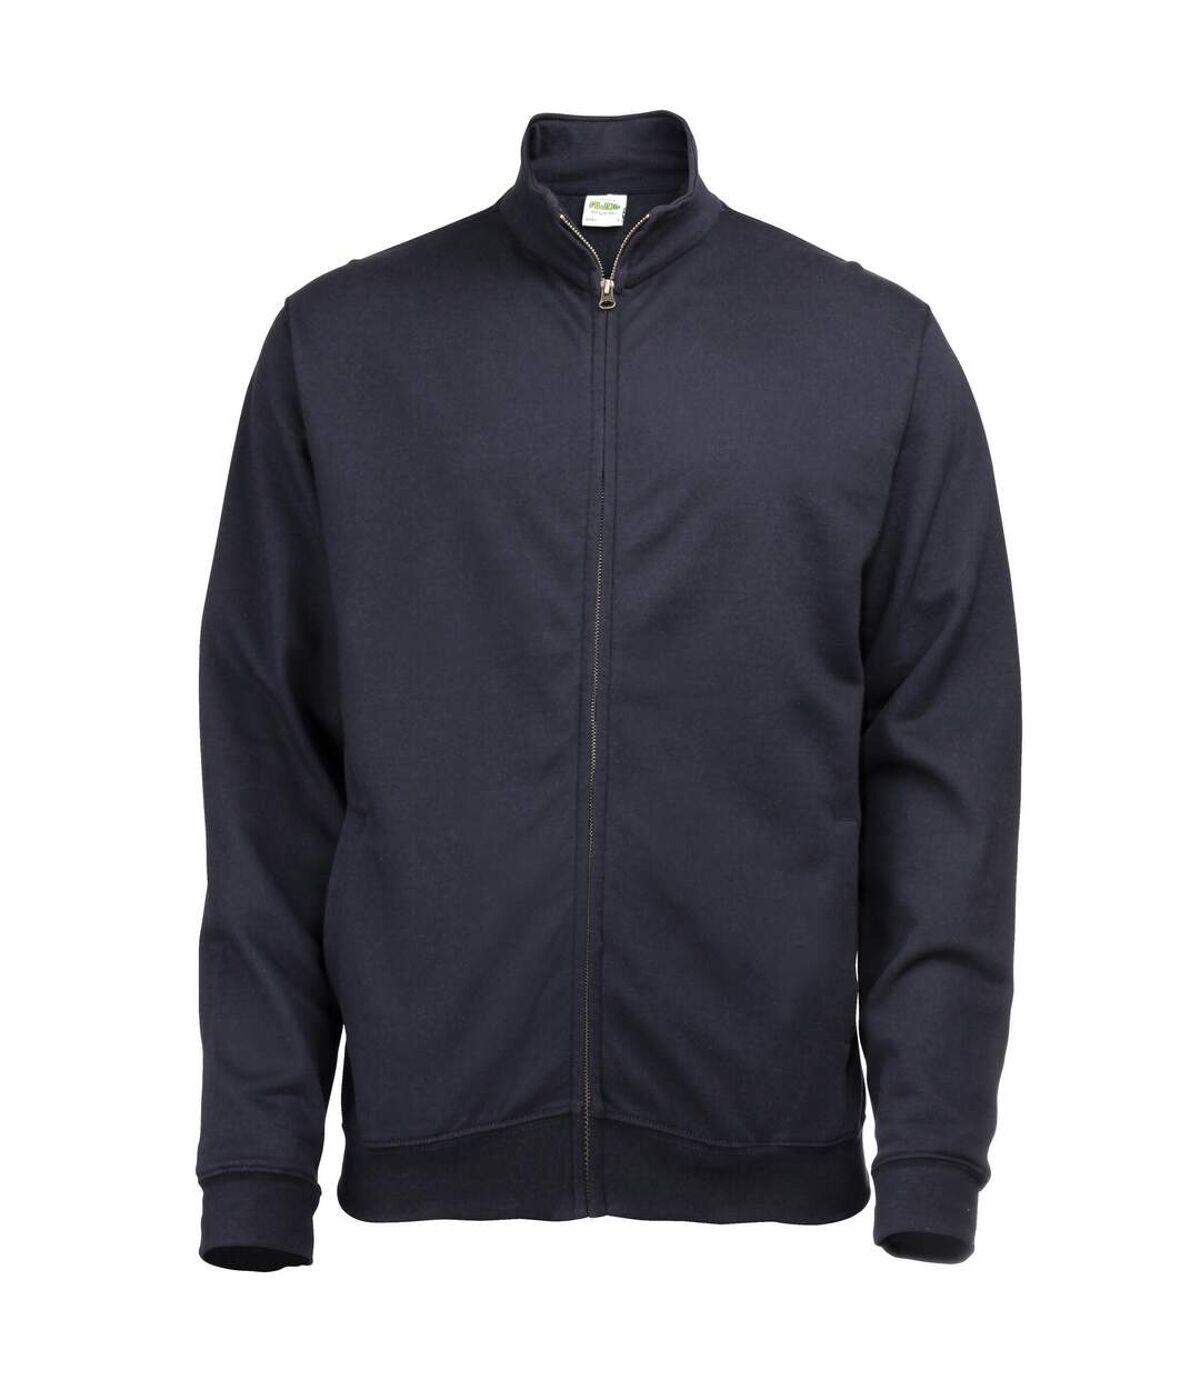 Awdis Mens Plain Fresher Full Zip Sweat / Sweatshirt / Outerwear (Burgundy) - UTRW178